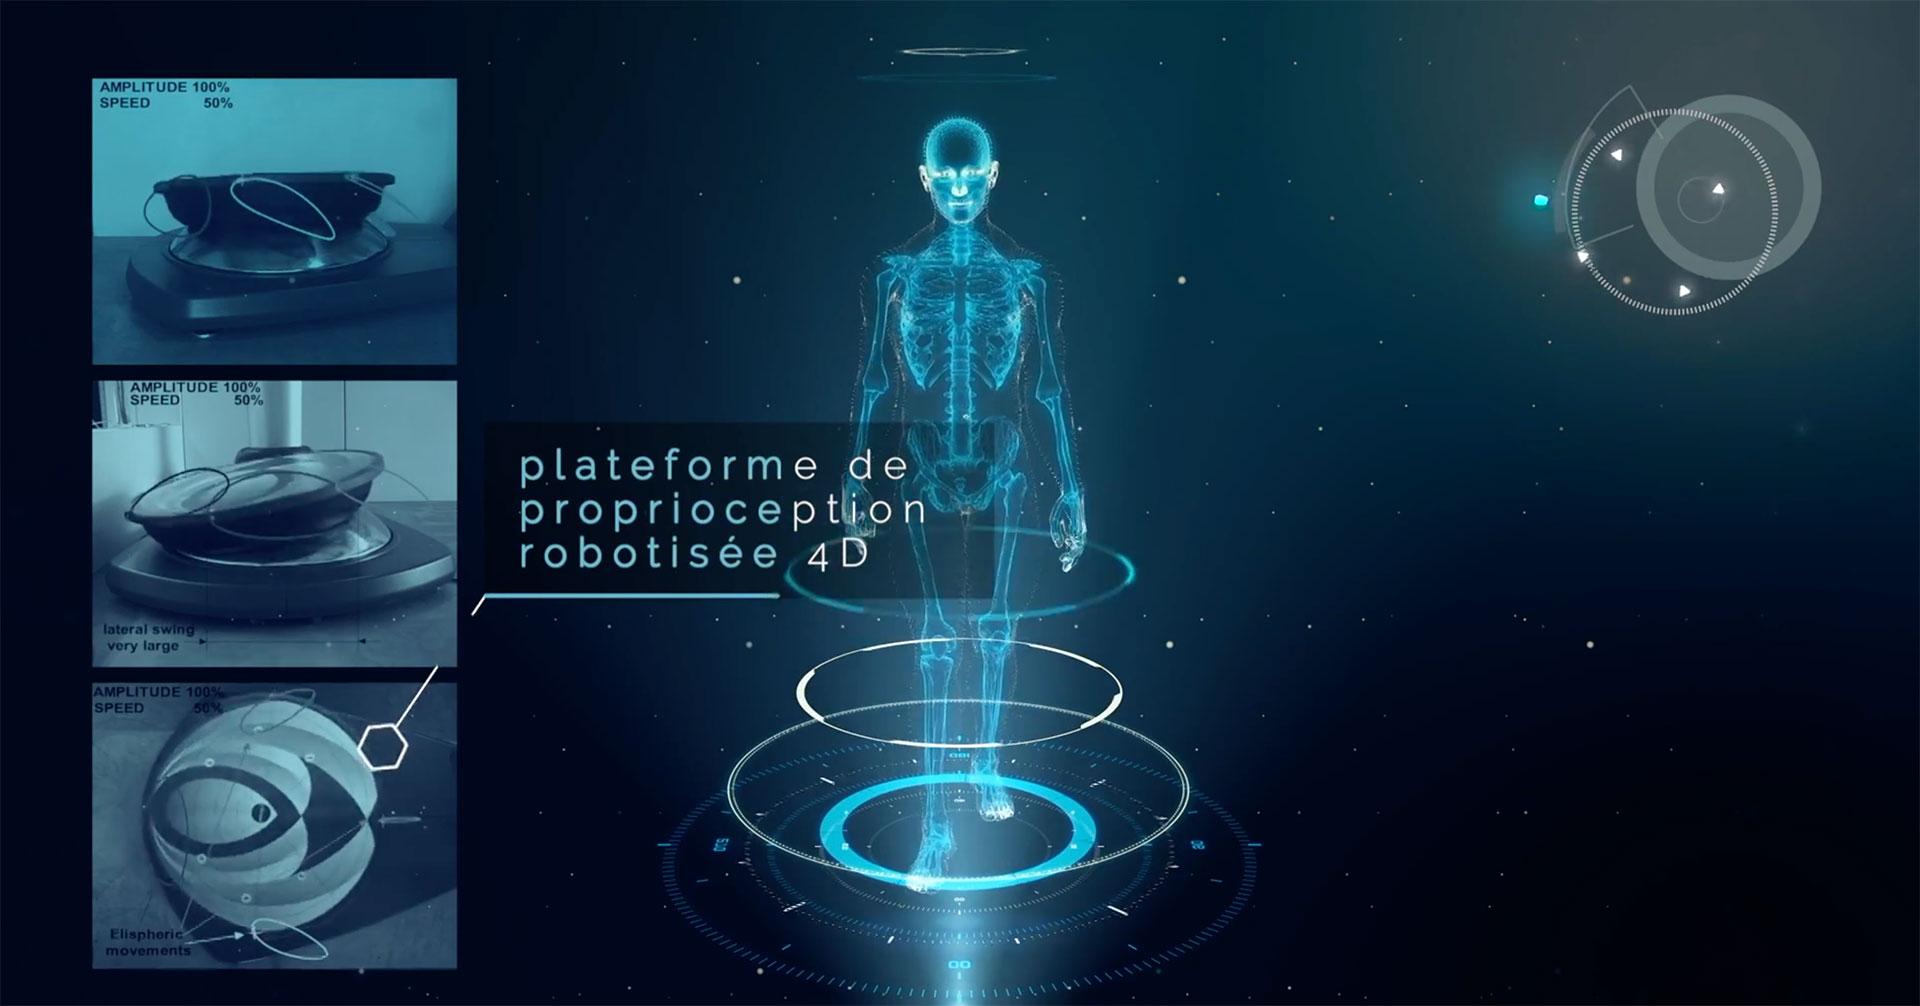 plateforme motorisee kine - proprioception